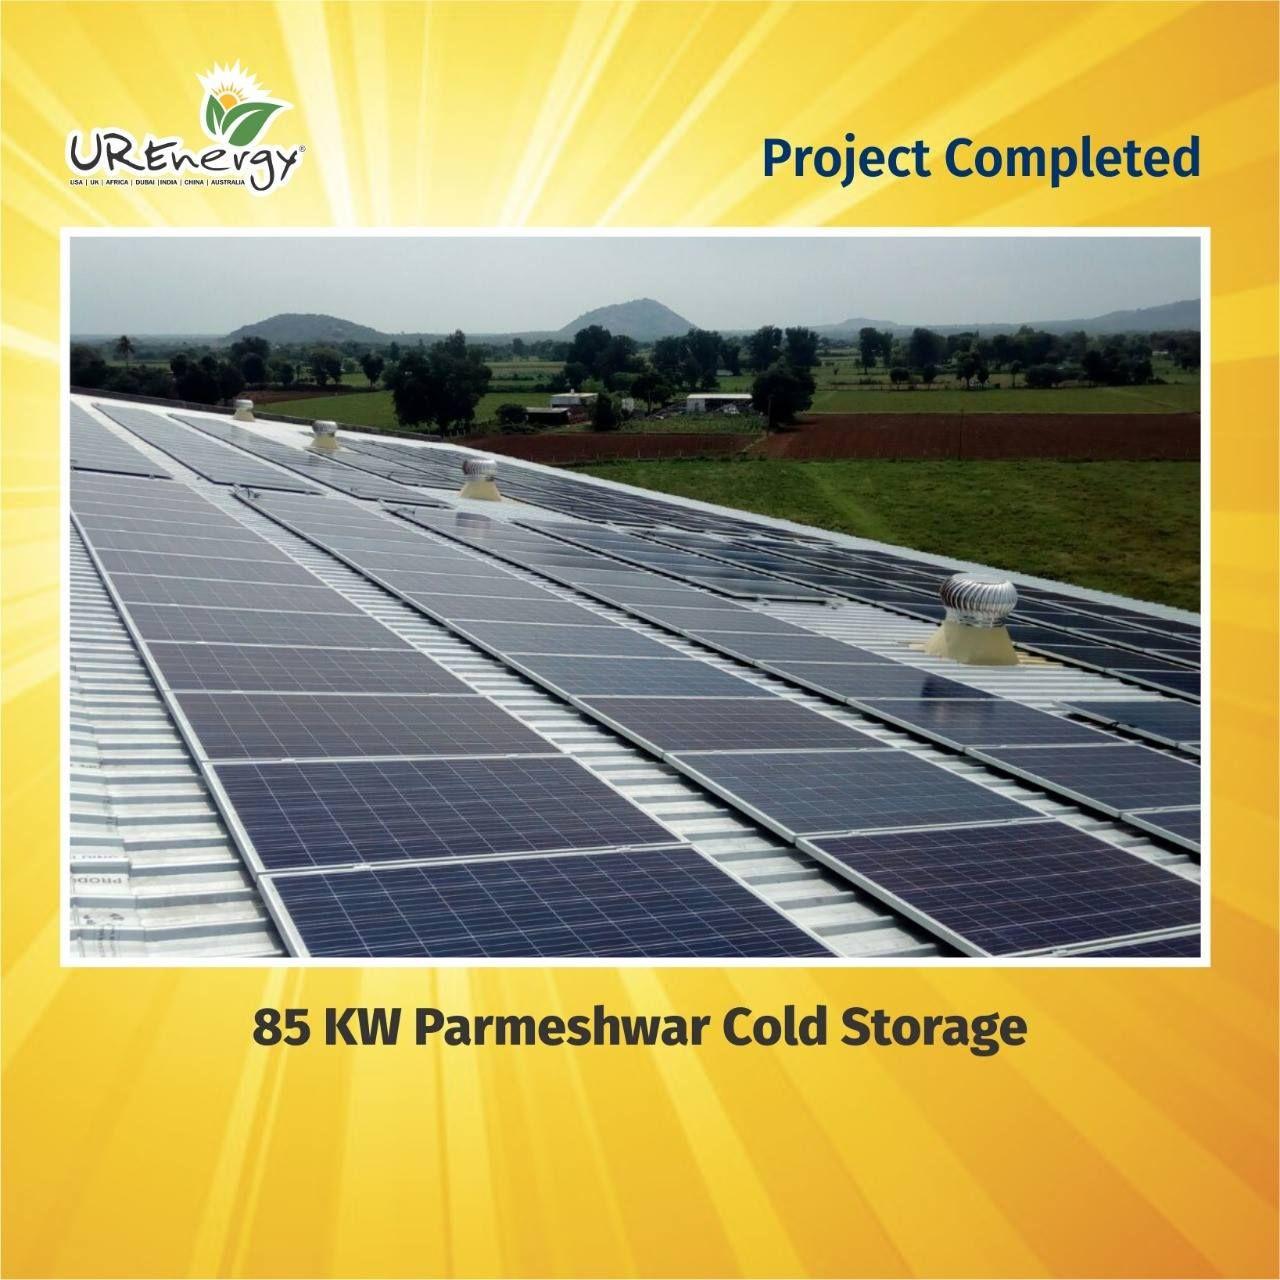 Rooftop Solar Panel Inverters Water Pump Solar Epc Gujarat India U R Energy Solar Water Pump Solar Renewable Energy Companies